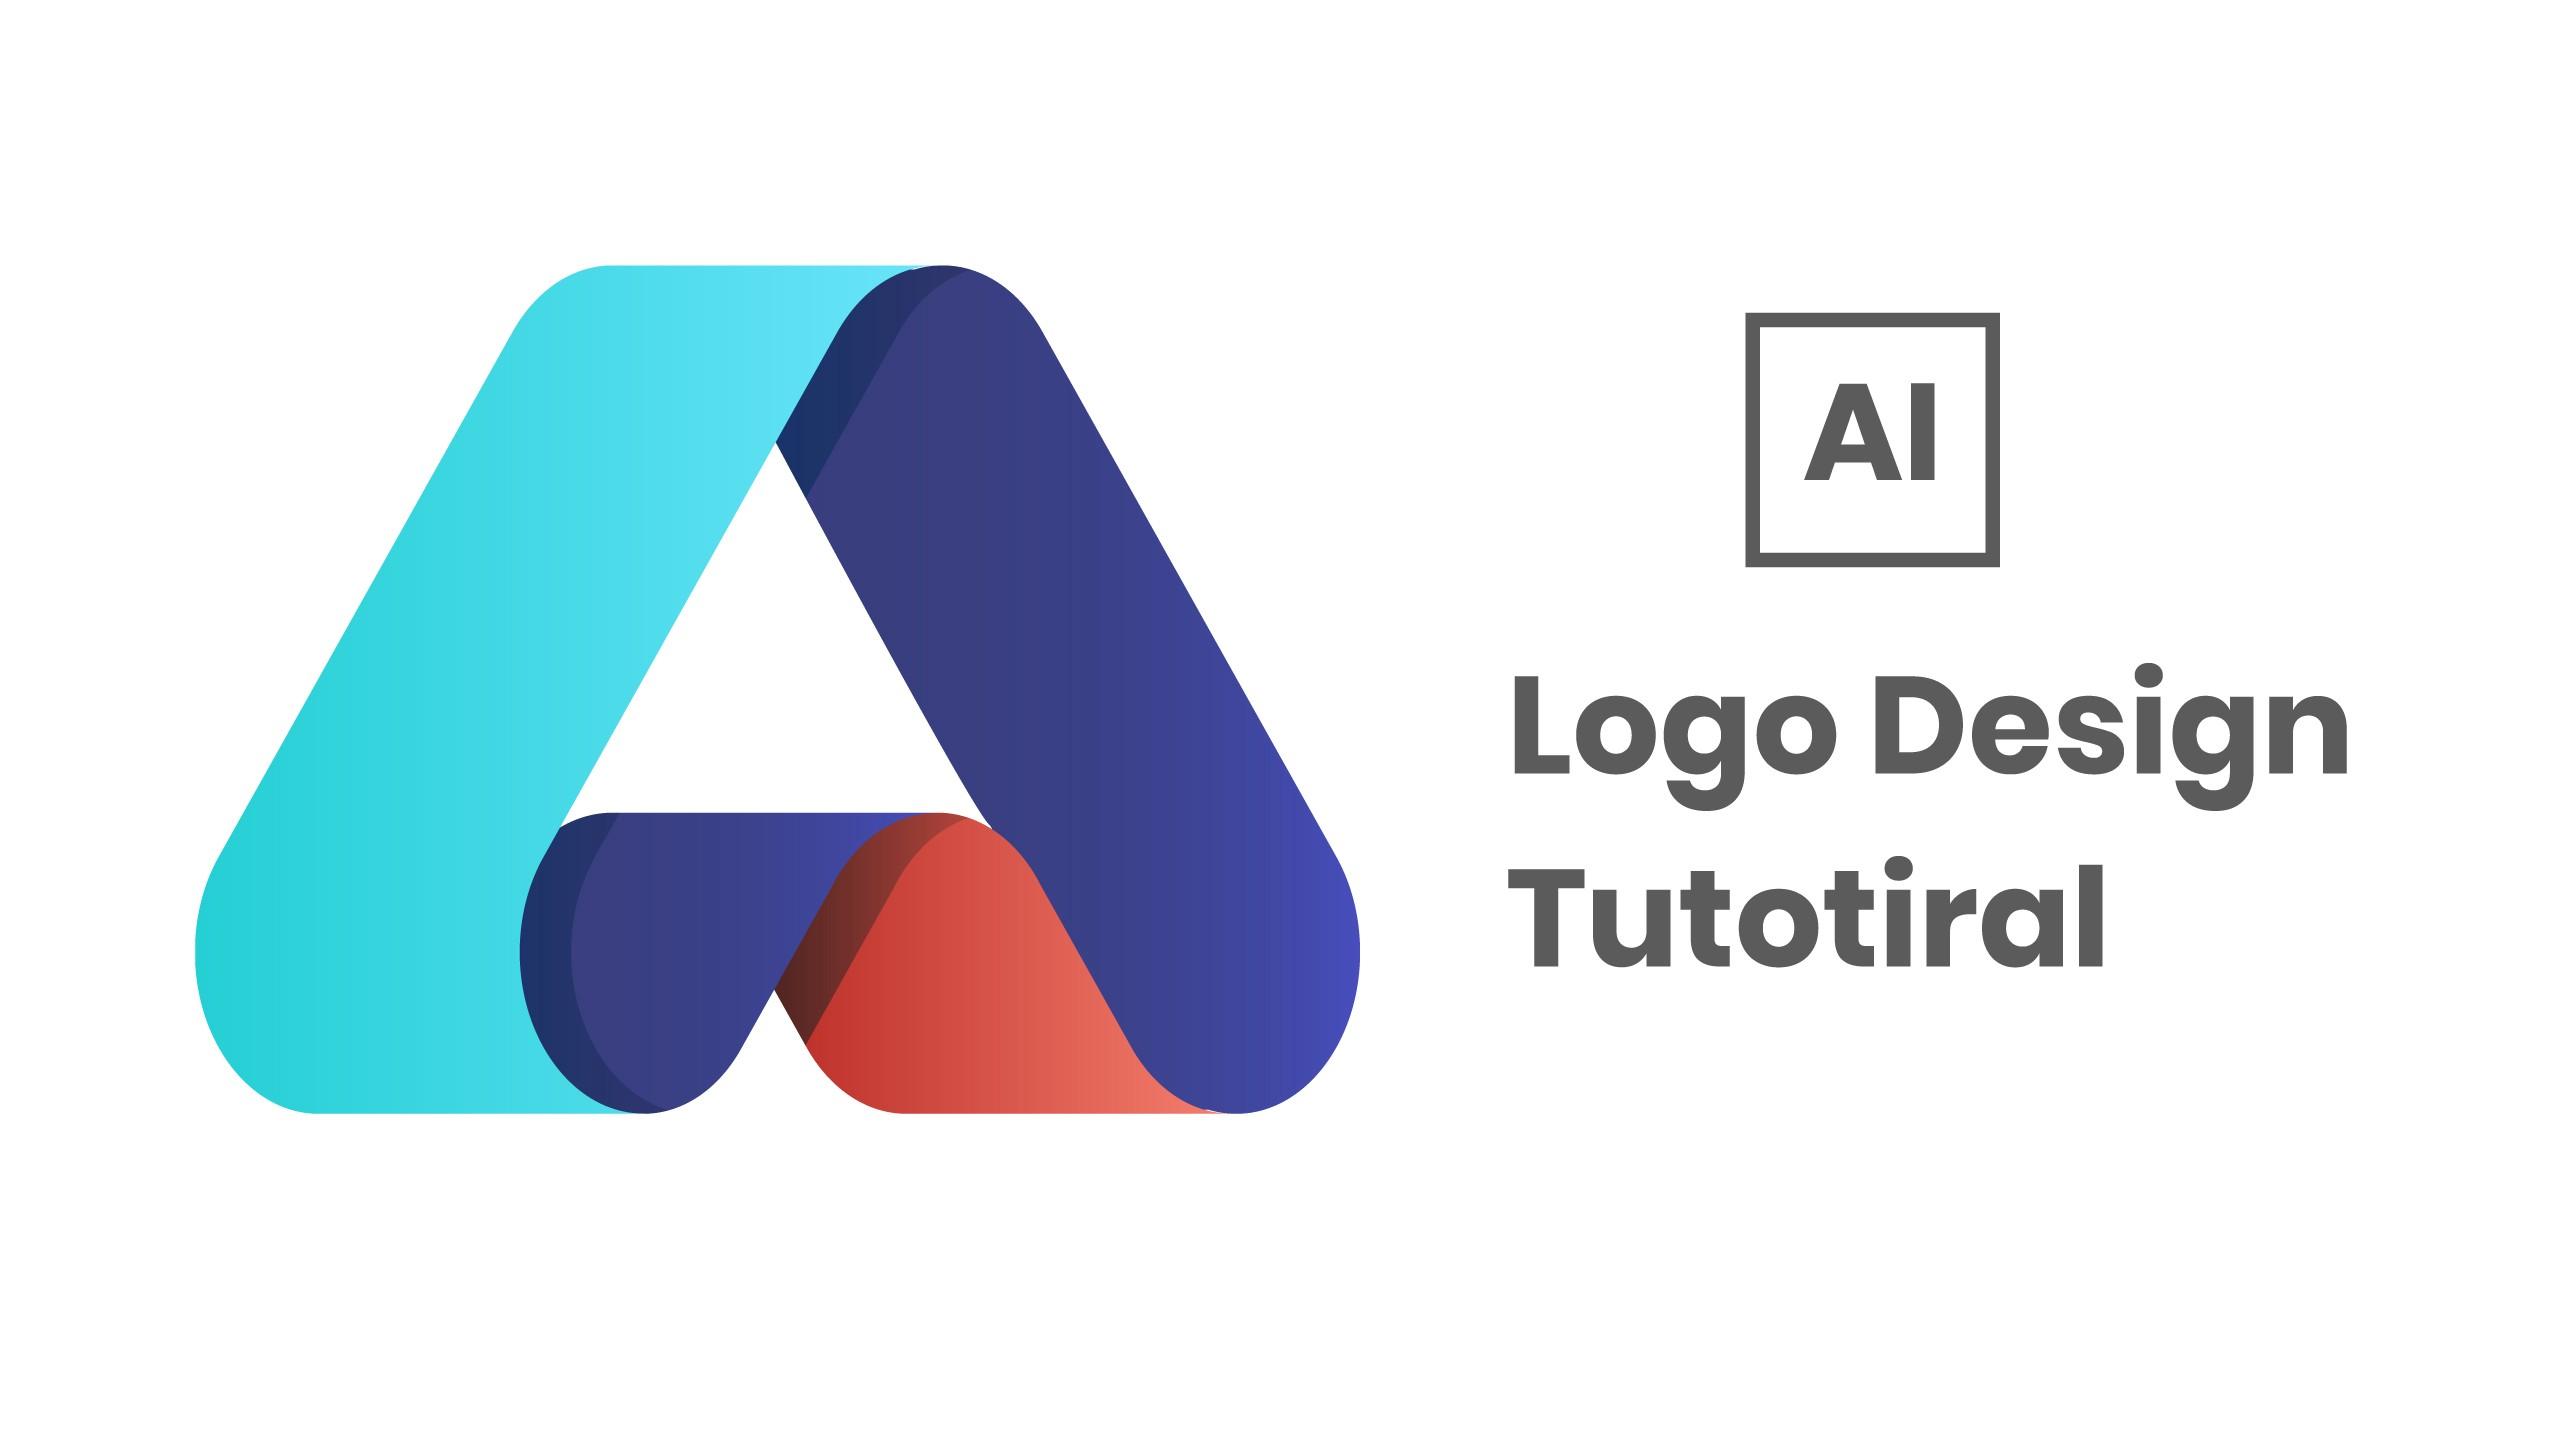 Letter A logo Design Tutorial in Adobe Illustrator.